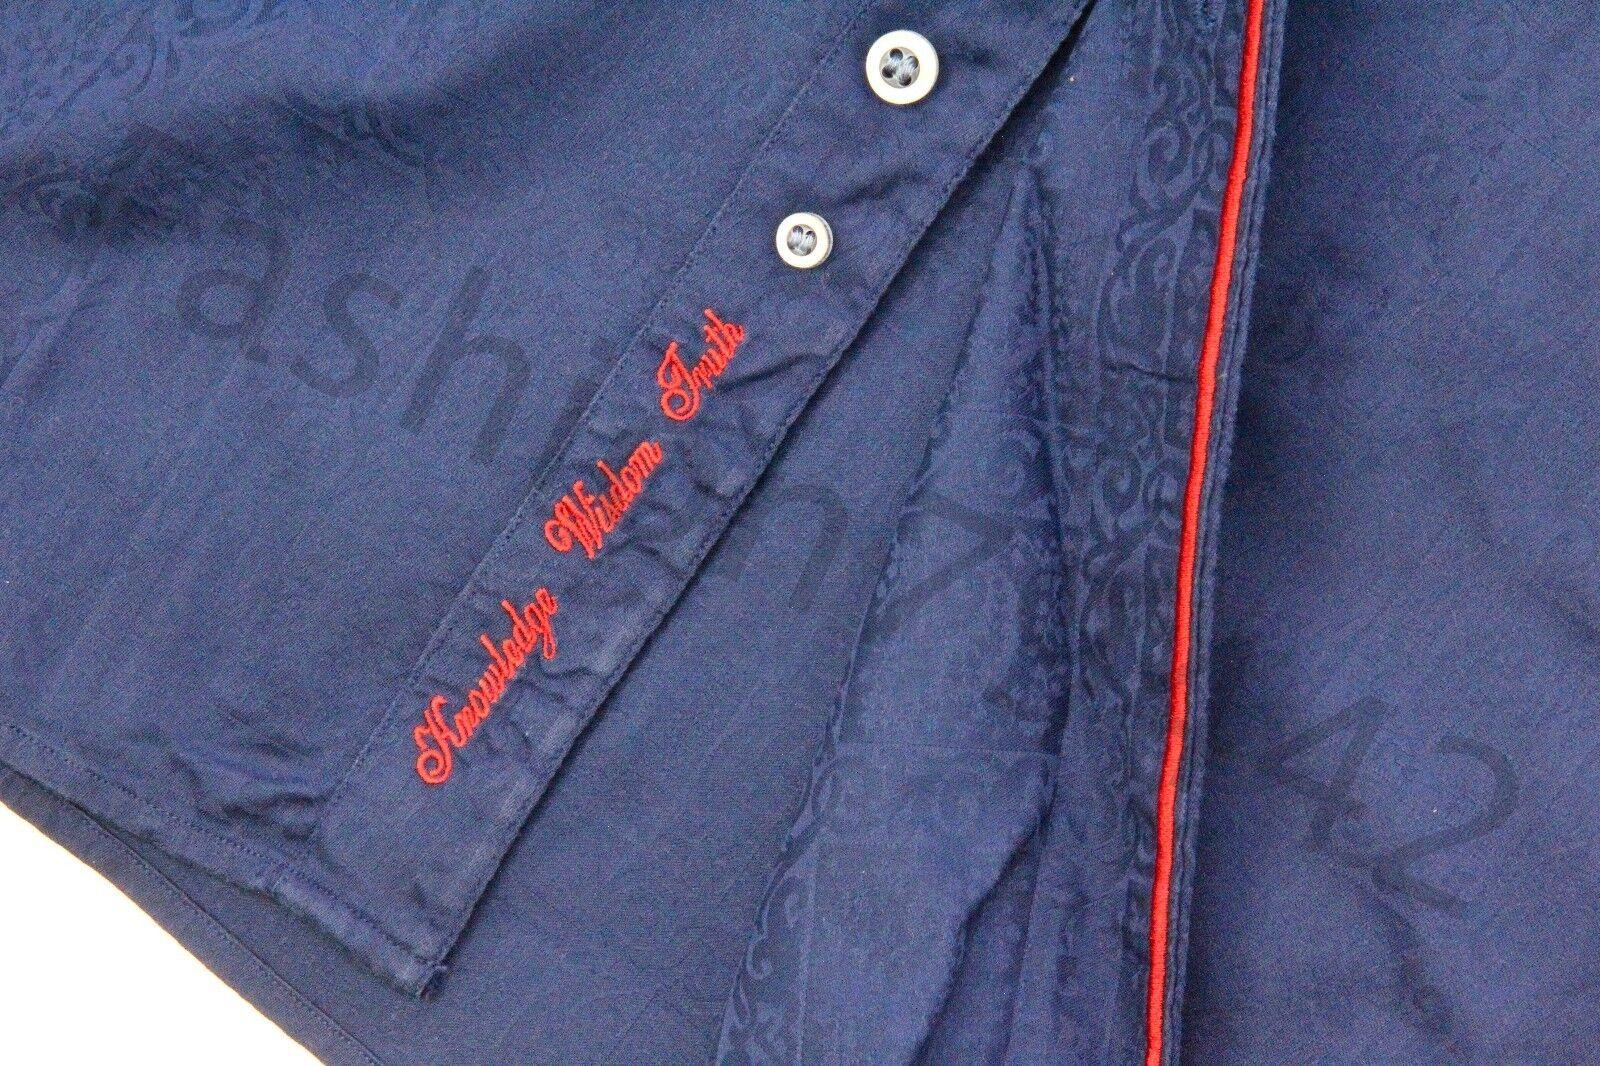 ROBERT GRAHAM - Shirt Men's XL bluee Geometric Fabric Red Trim Embroidery Cuff